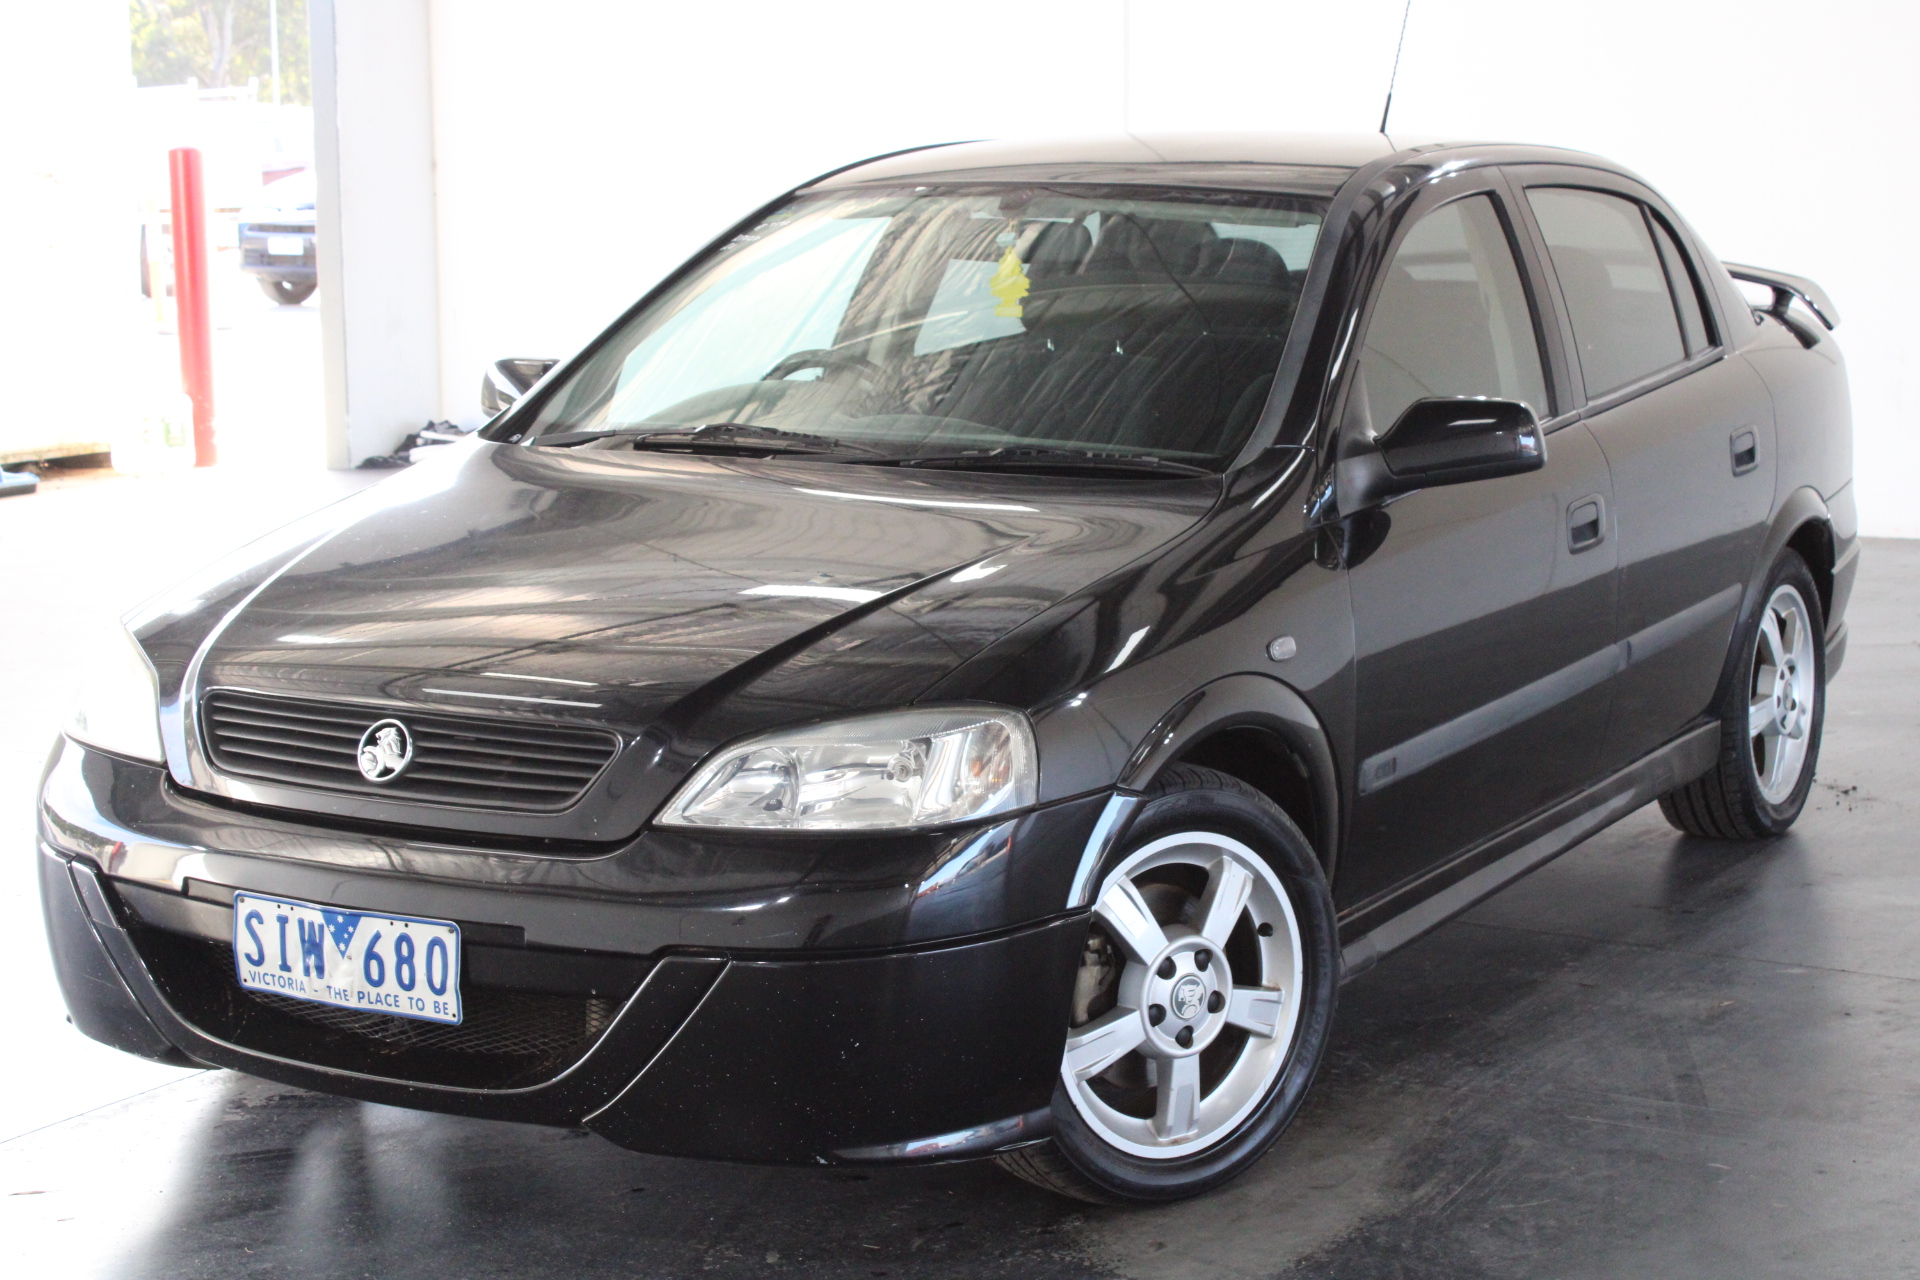 2003 Holden Astra CD TS Automatic Sedan